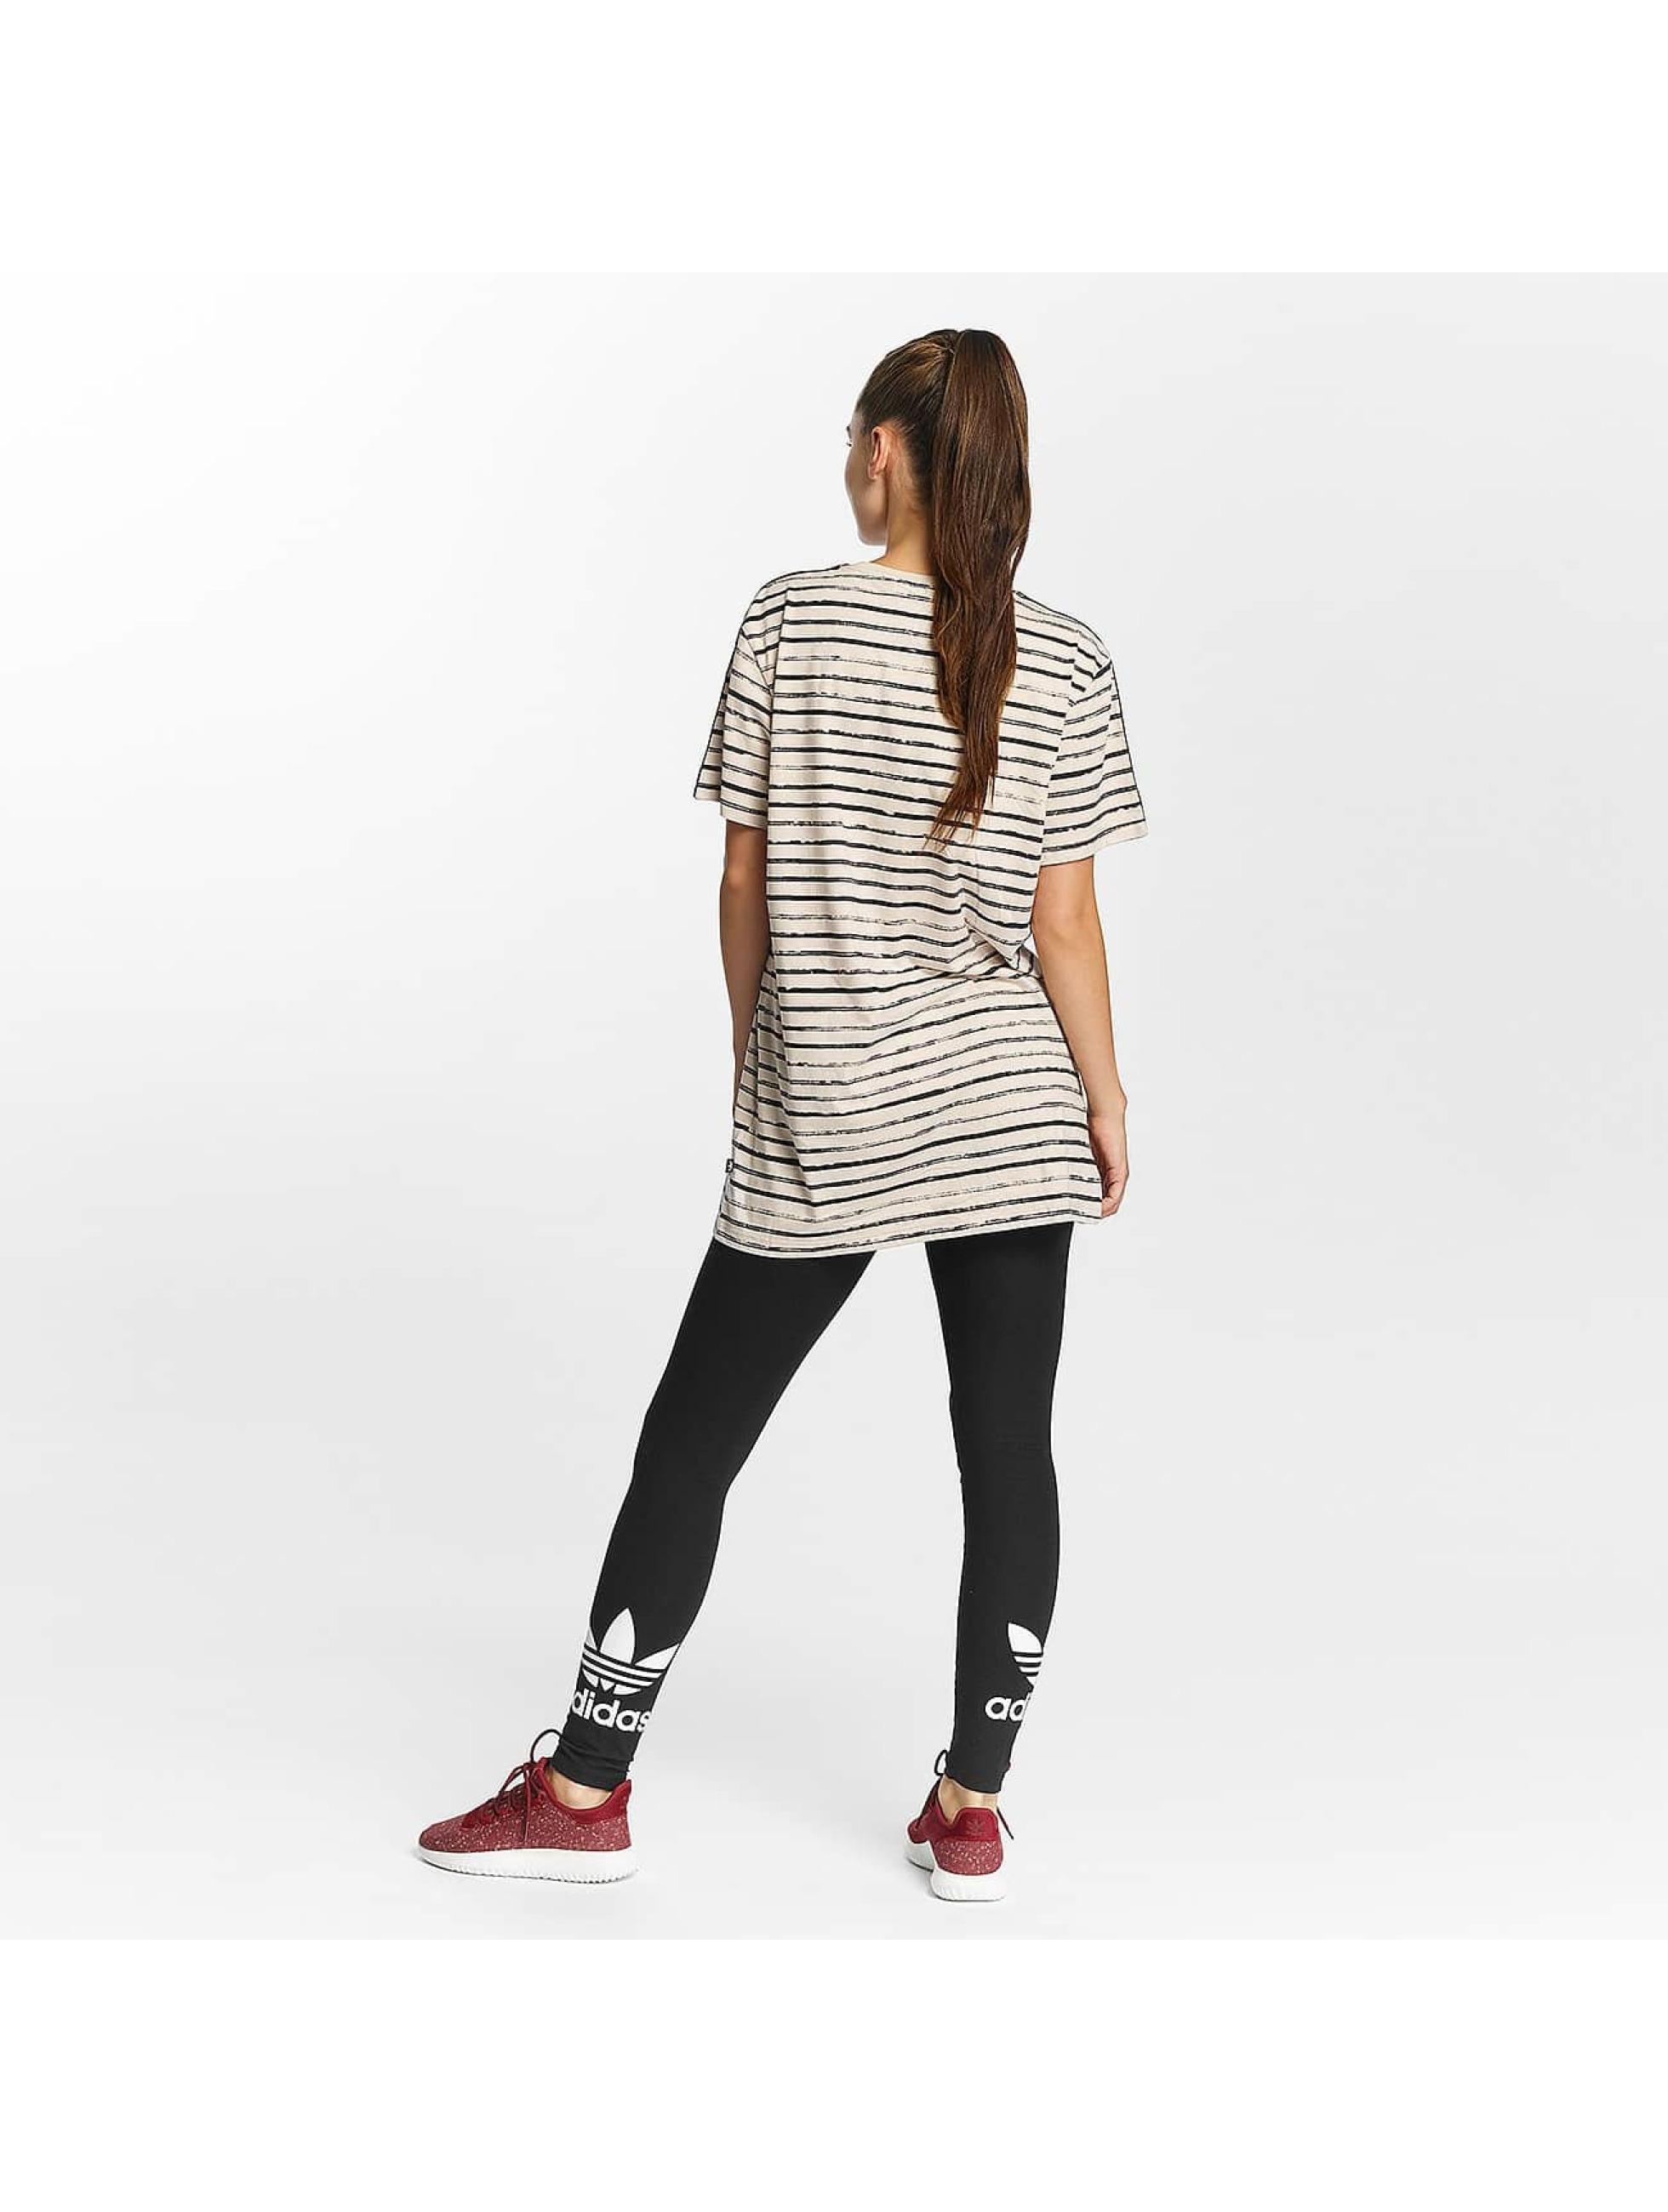 adidas marie antoinette brun femme t shirt adidas acheter pas cher haut 395002. Black Bedroom Furniture Sets. Home Design Ideas